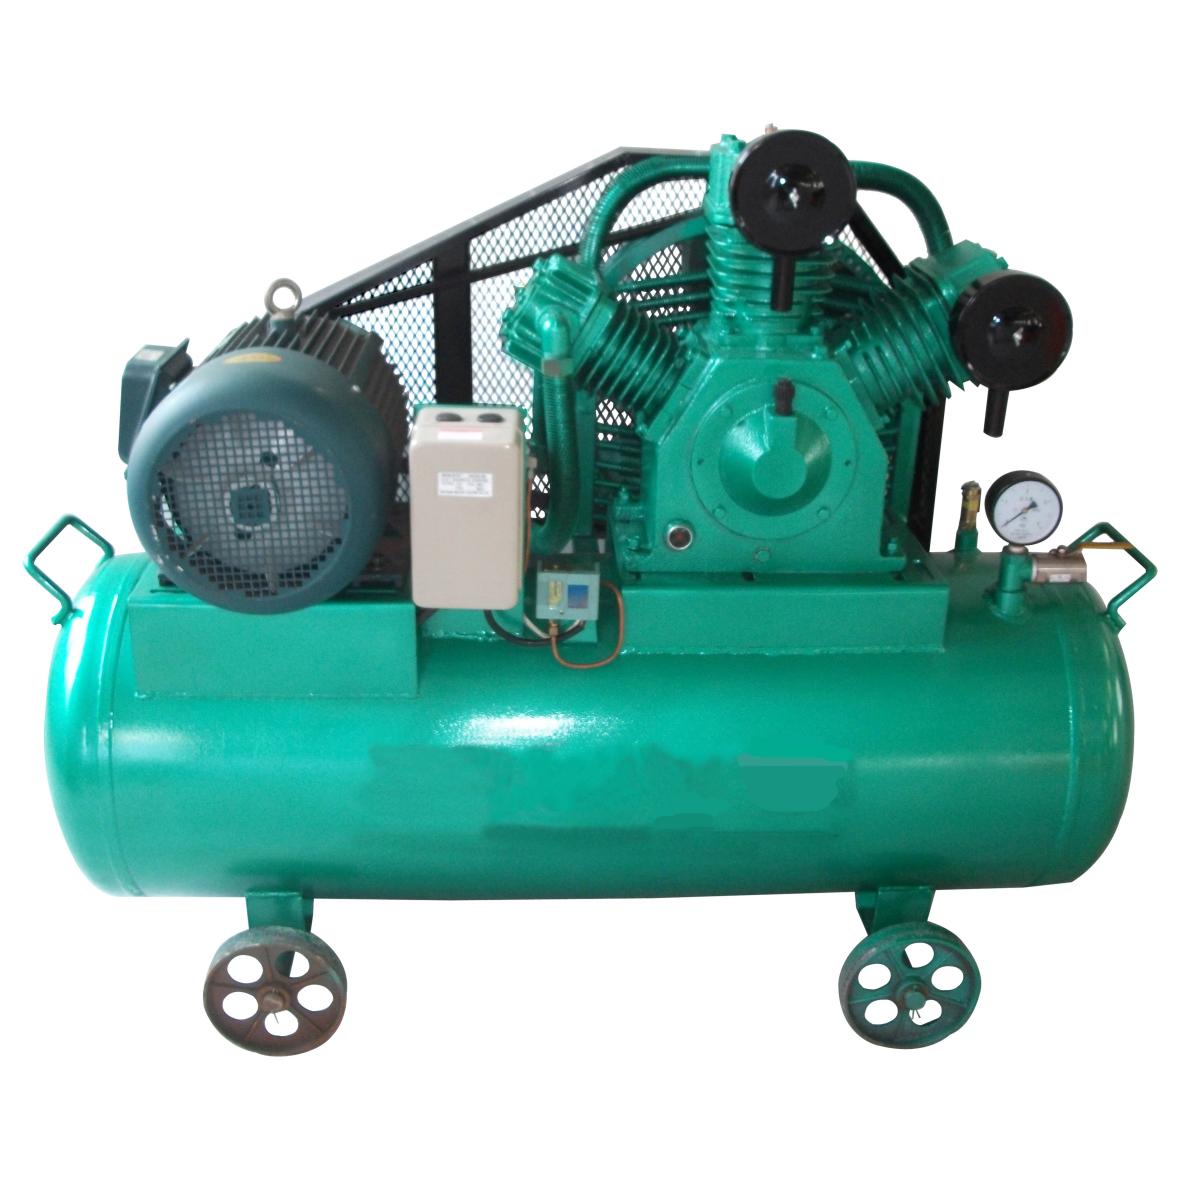 W-1.0/30 Air Compressor Machine Featured Image